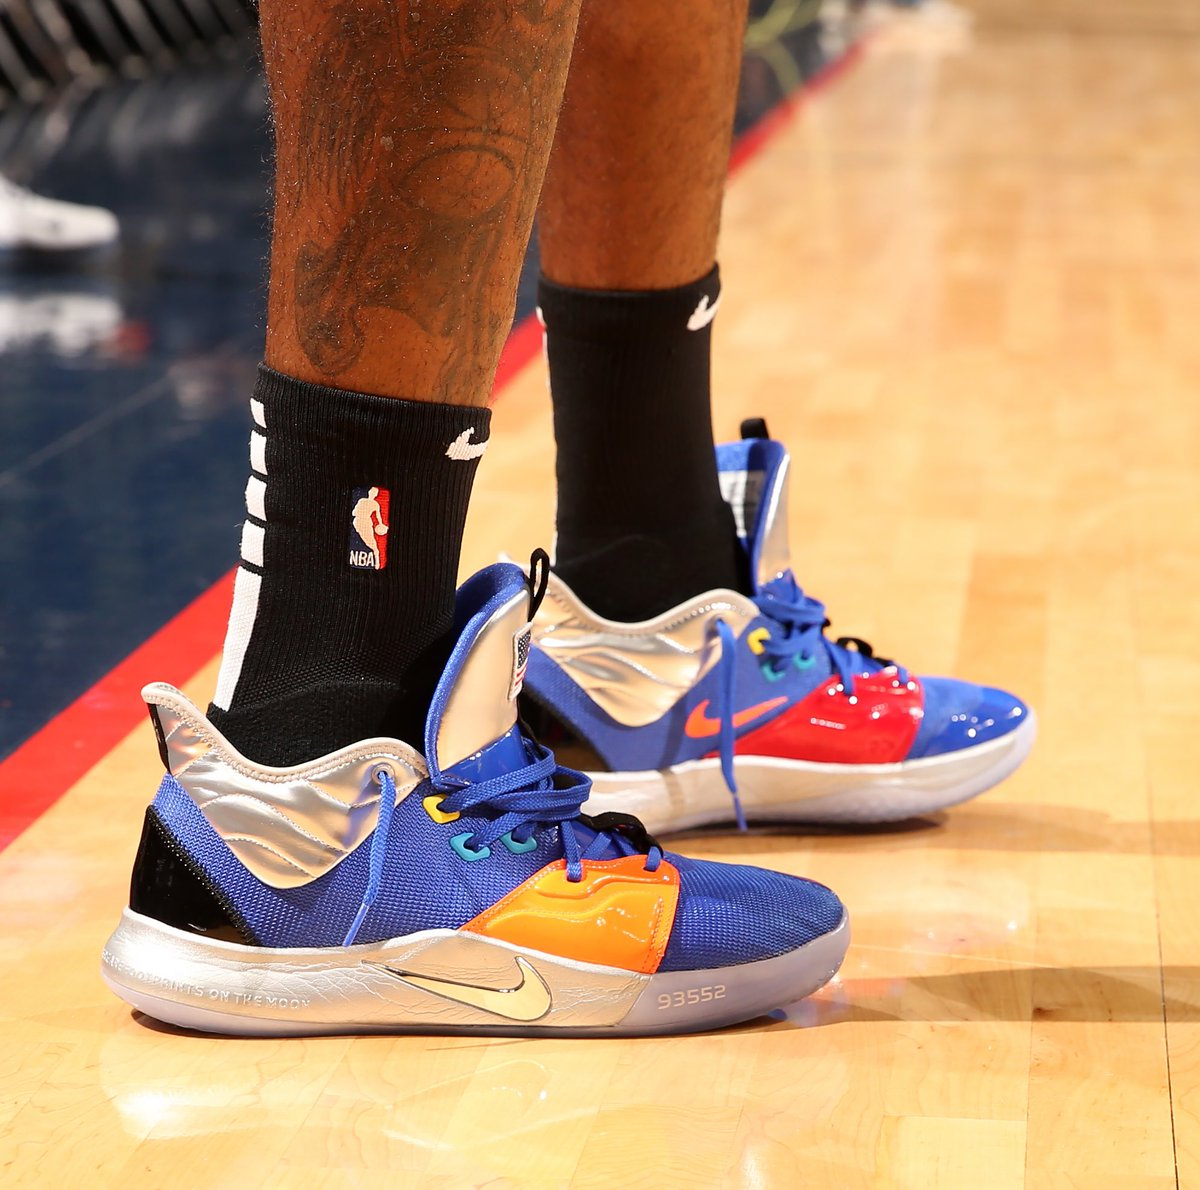 Paul George returns to action in the NASA Blue Nike PG 3! #NBAKicks #ClipperNation